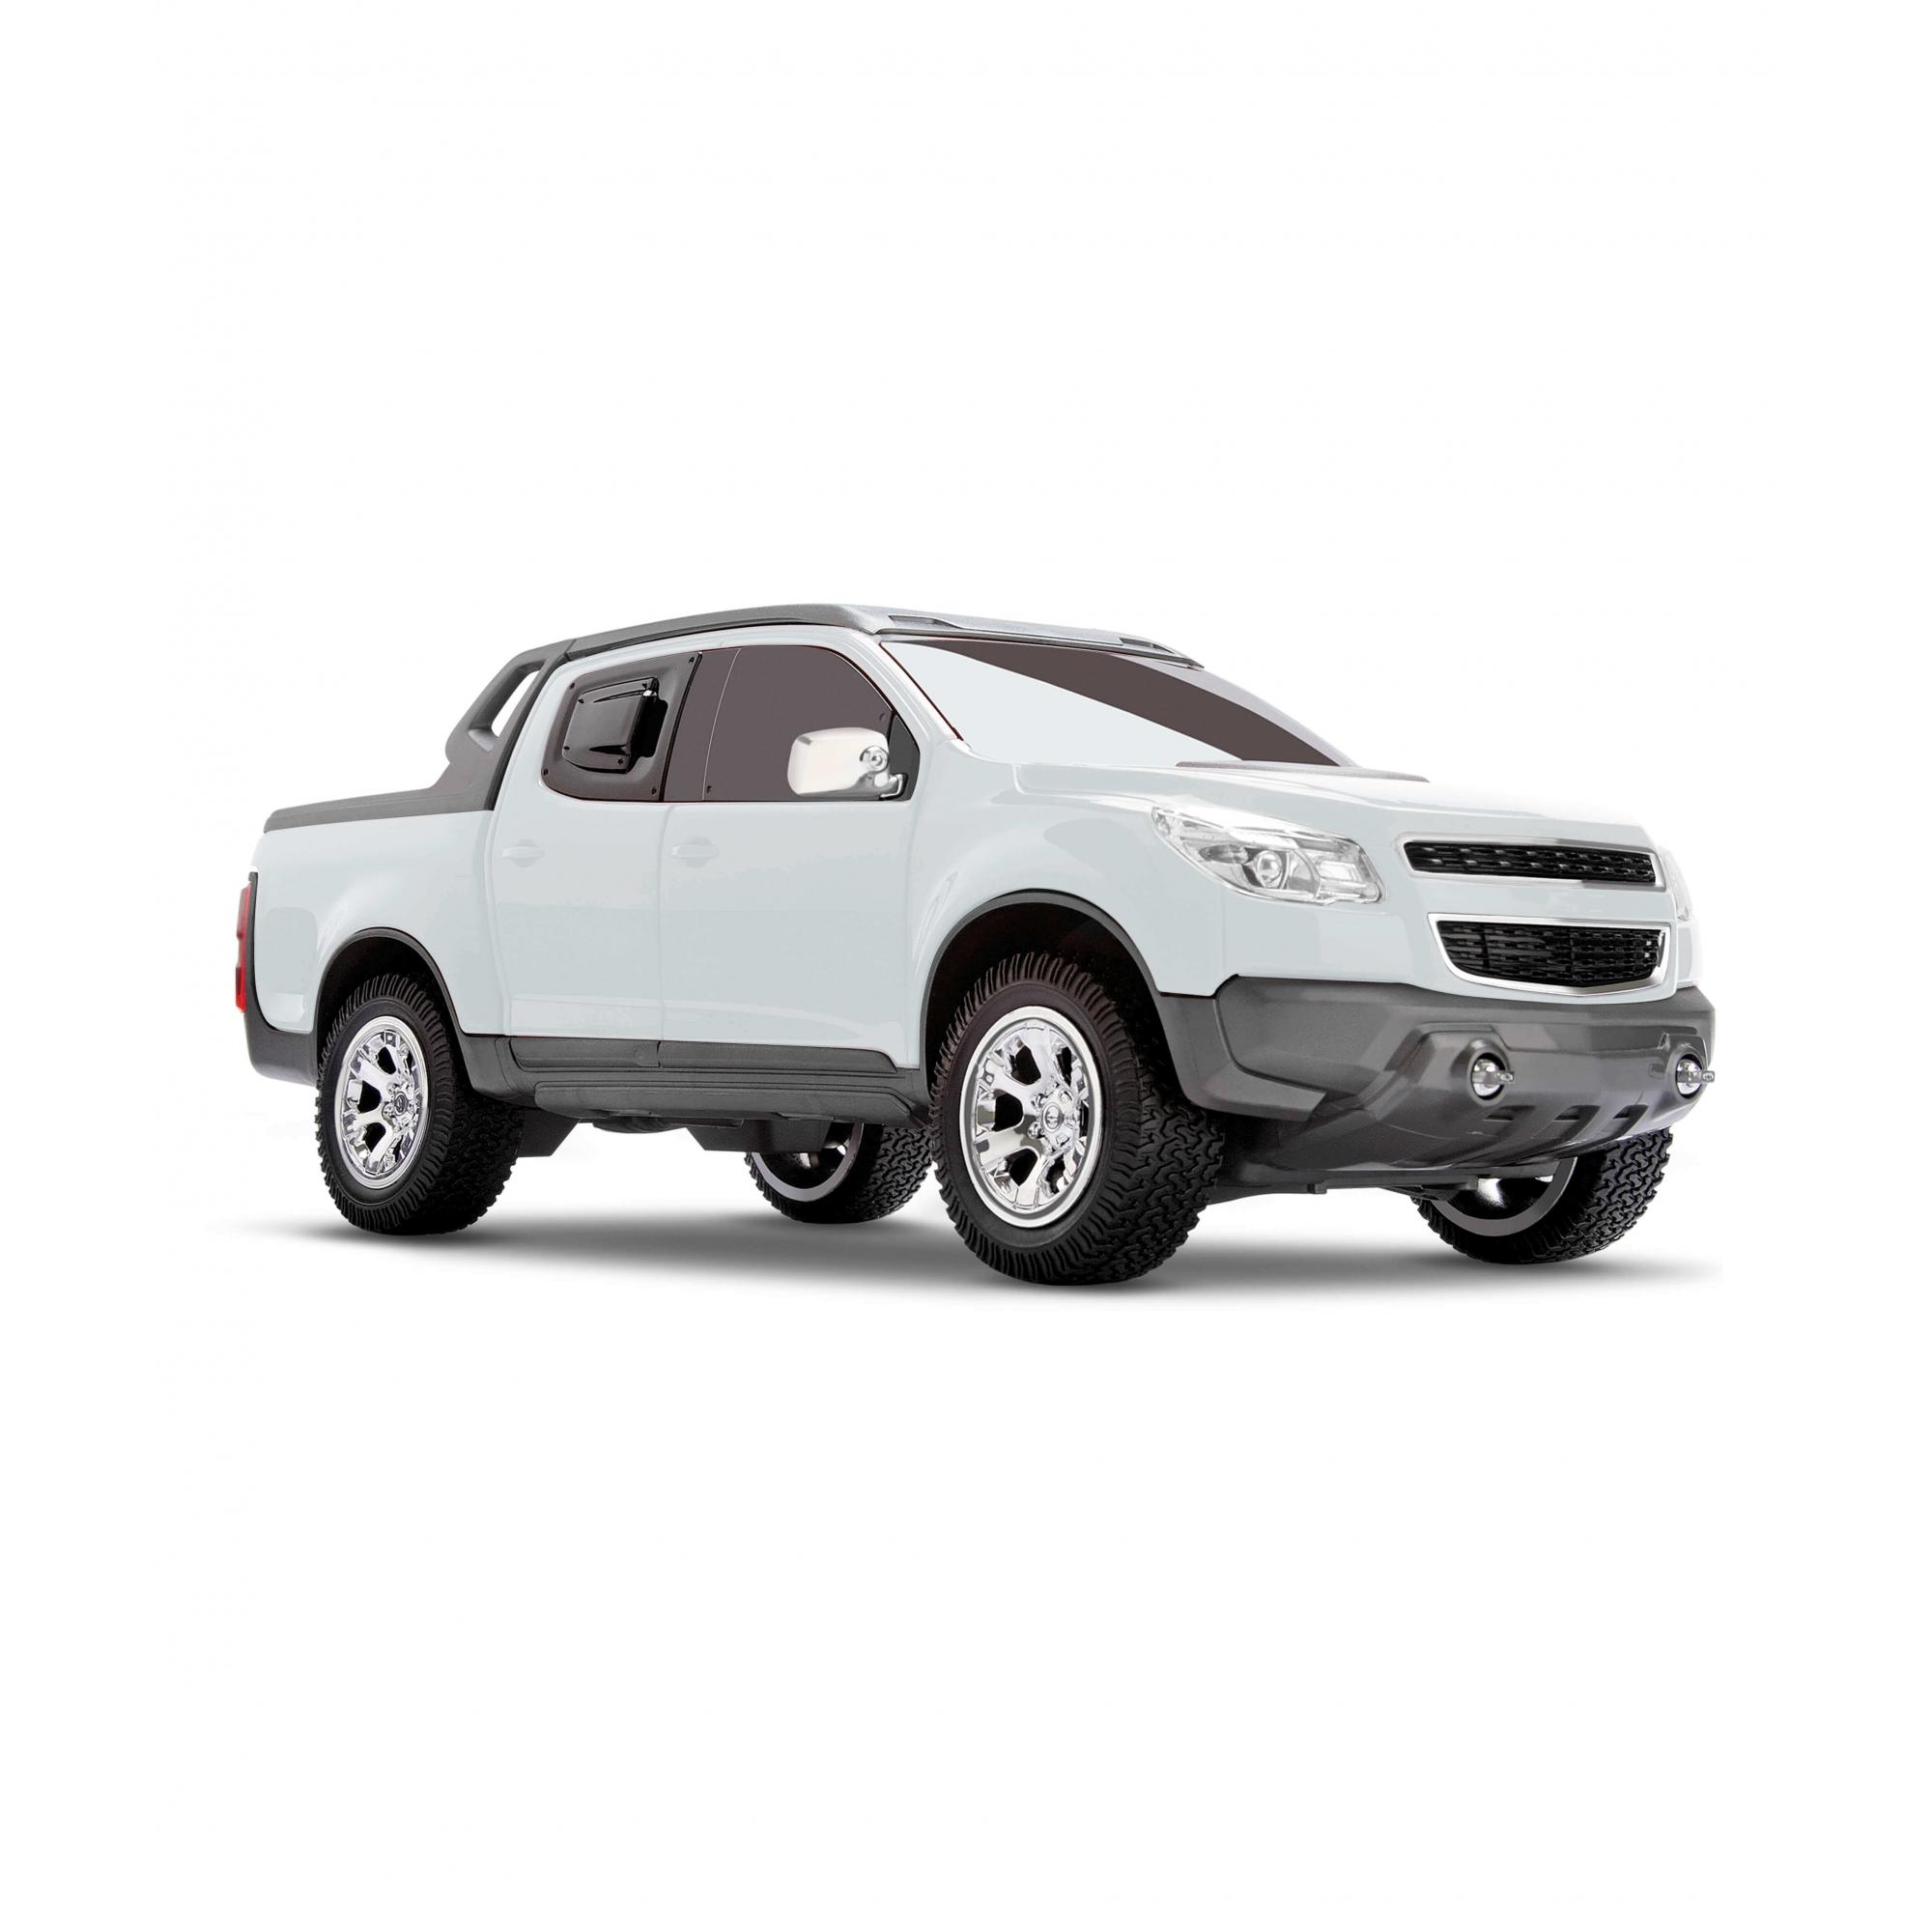 Miniatura Chevrolet S-10 Rally - Branca